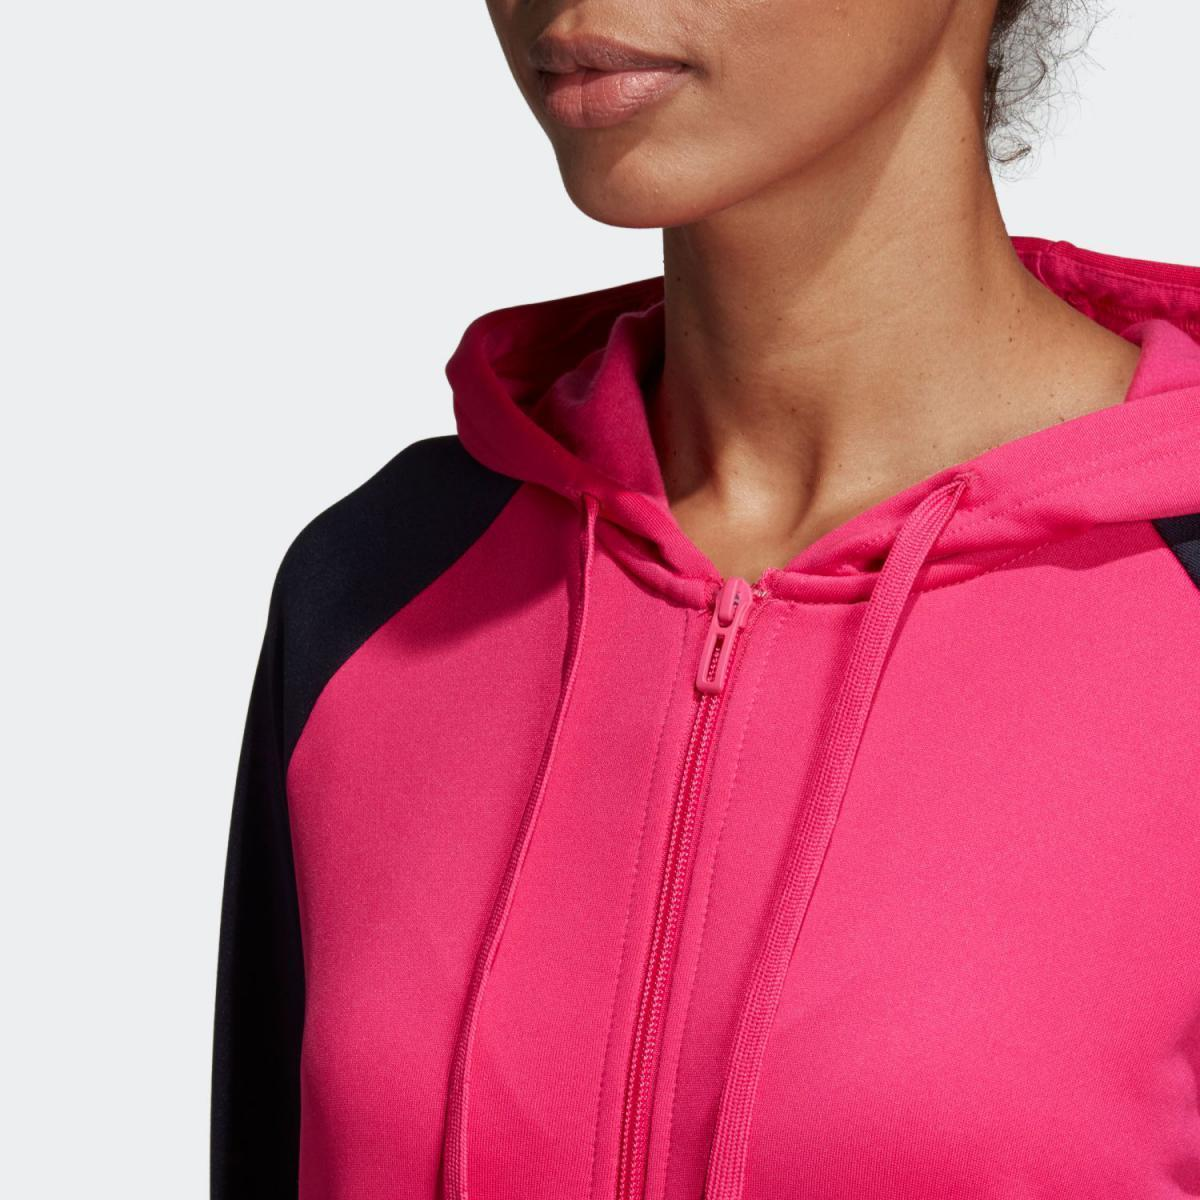 ea8e3ea0 Спортивный костюм Adidas Linear Tracksuit Regular DV2426: продажа ...